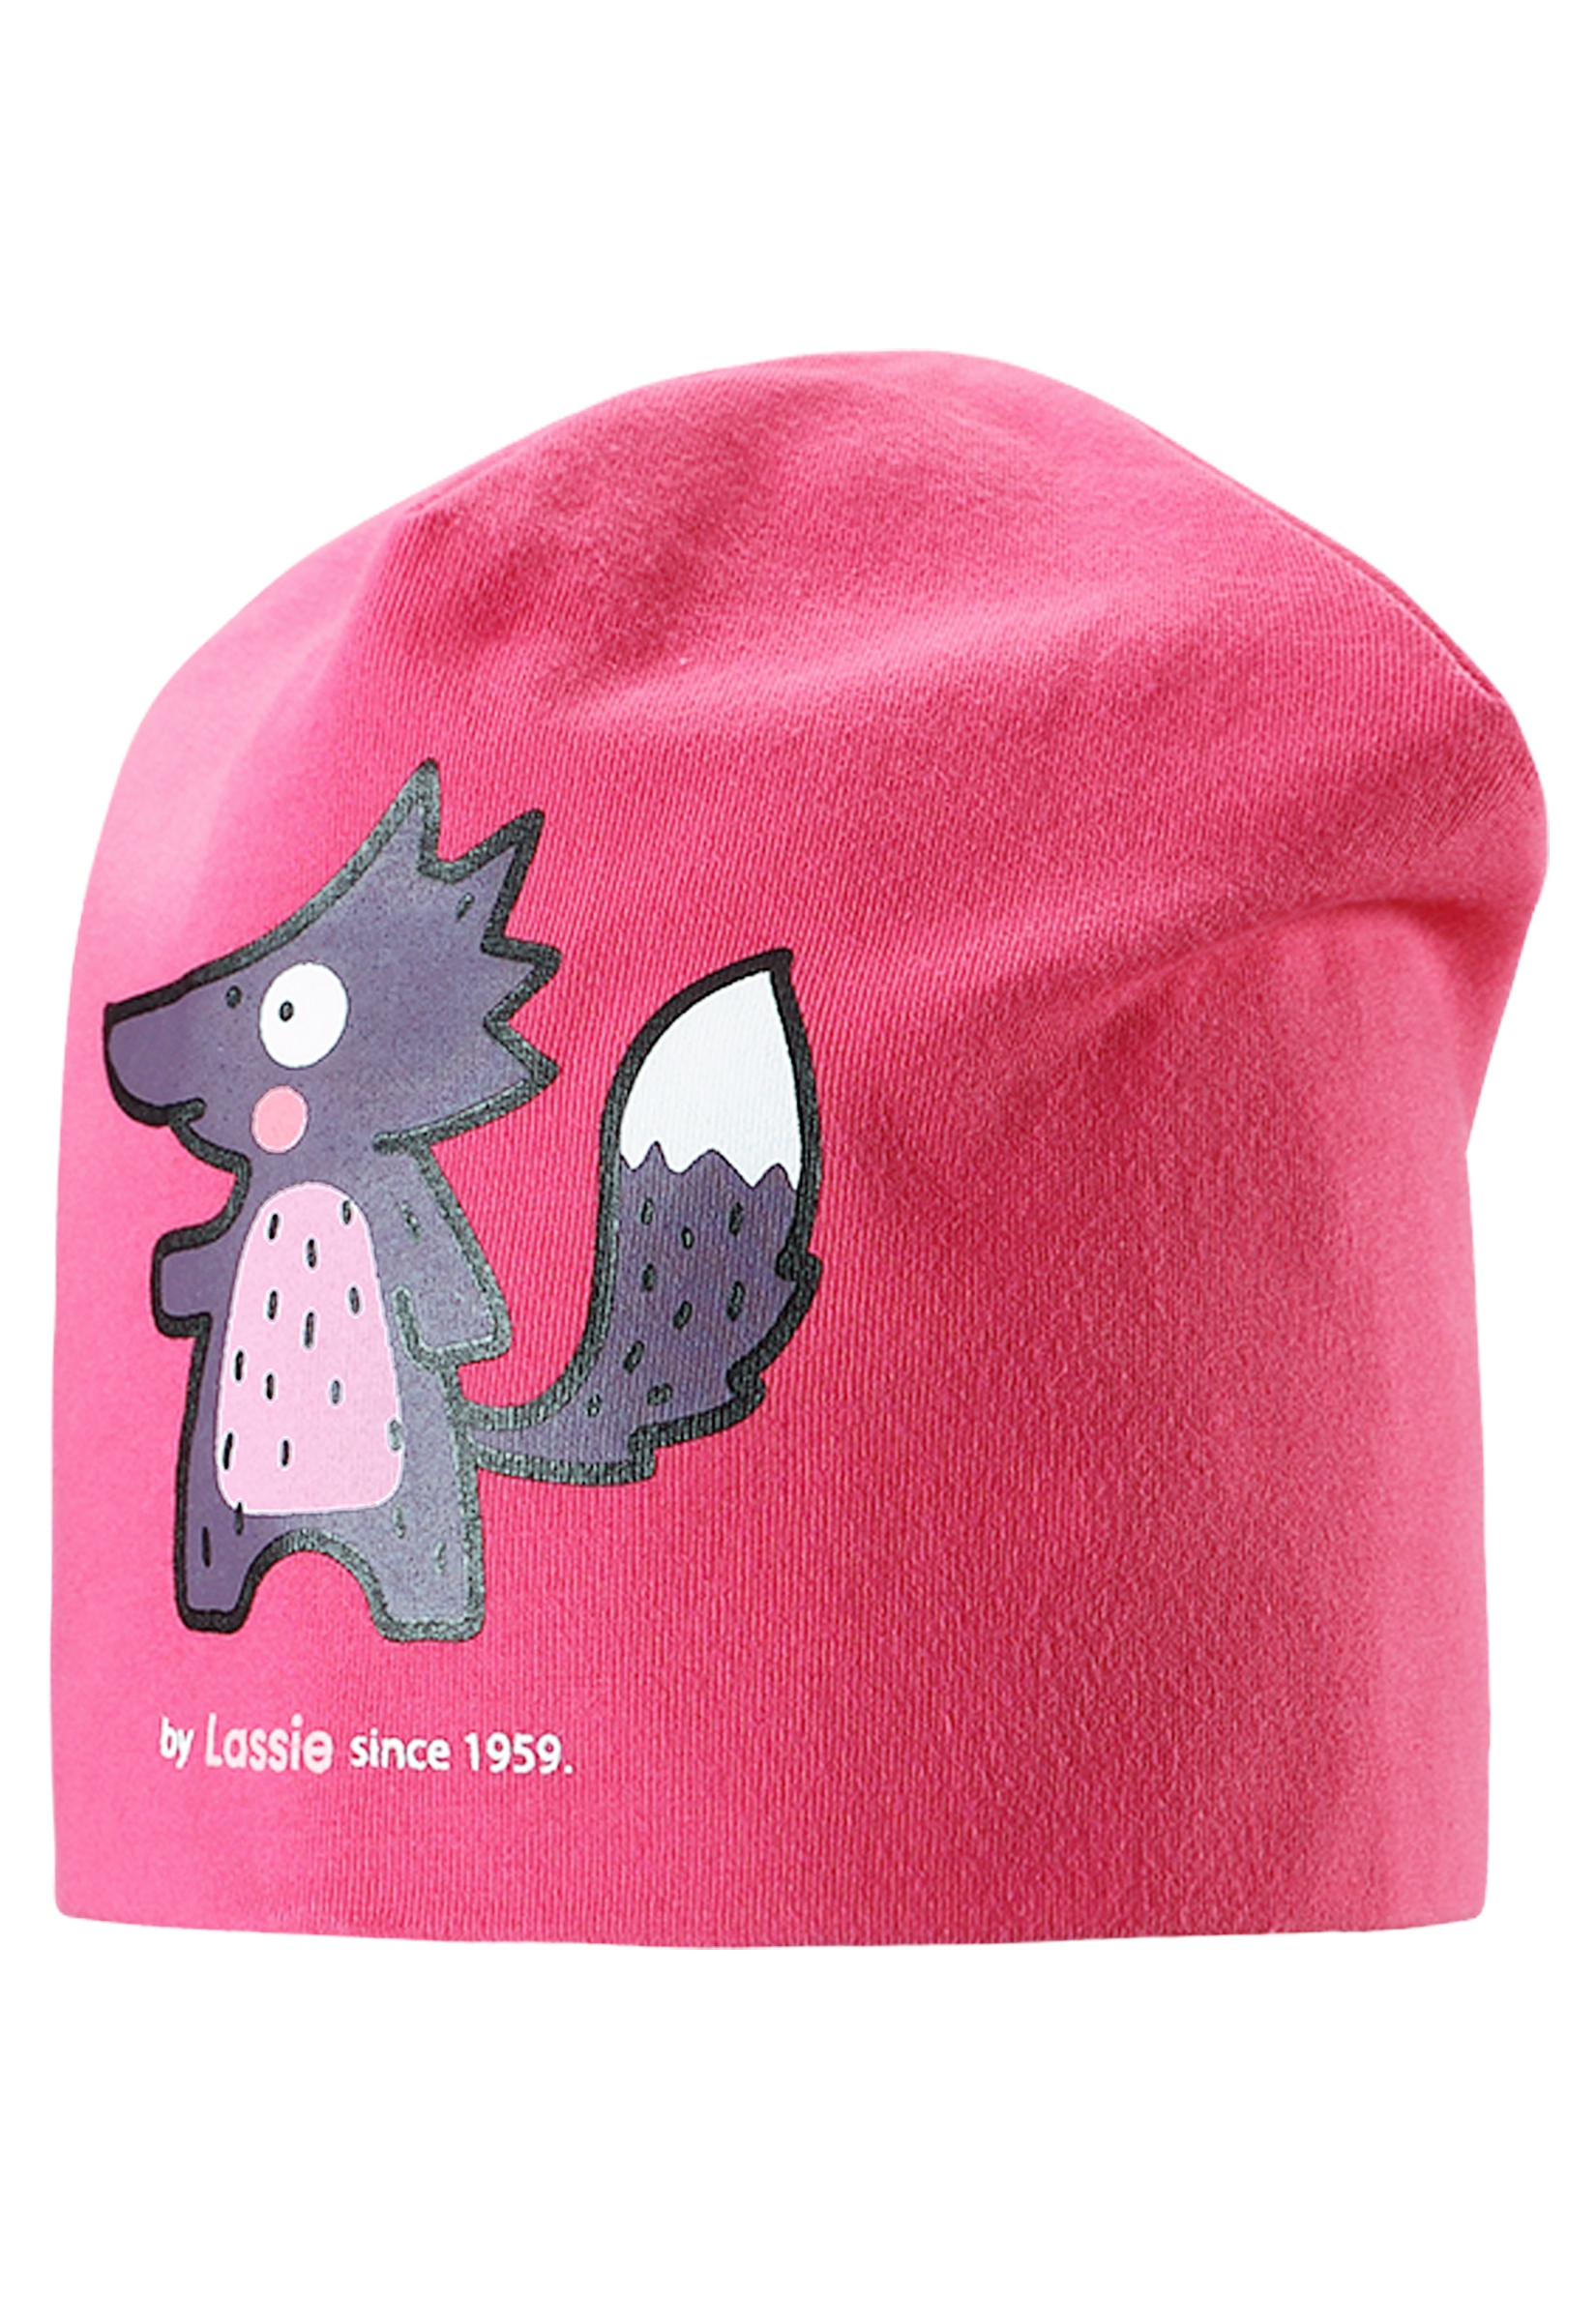 Головные уборы Lassie by Reima Шапка для девочки Lassie by Reima, розовый lassie by reima шапка для девочки lassie by reima